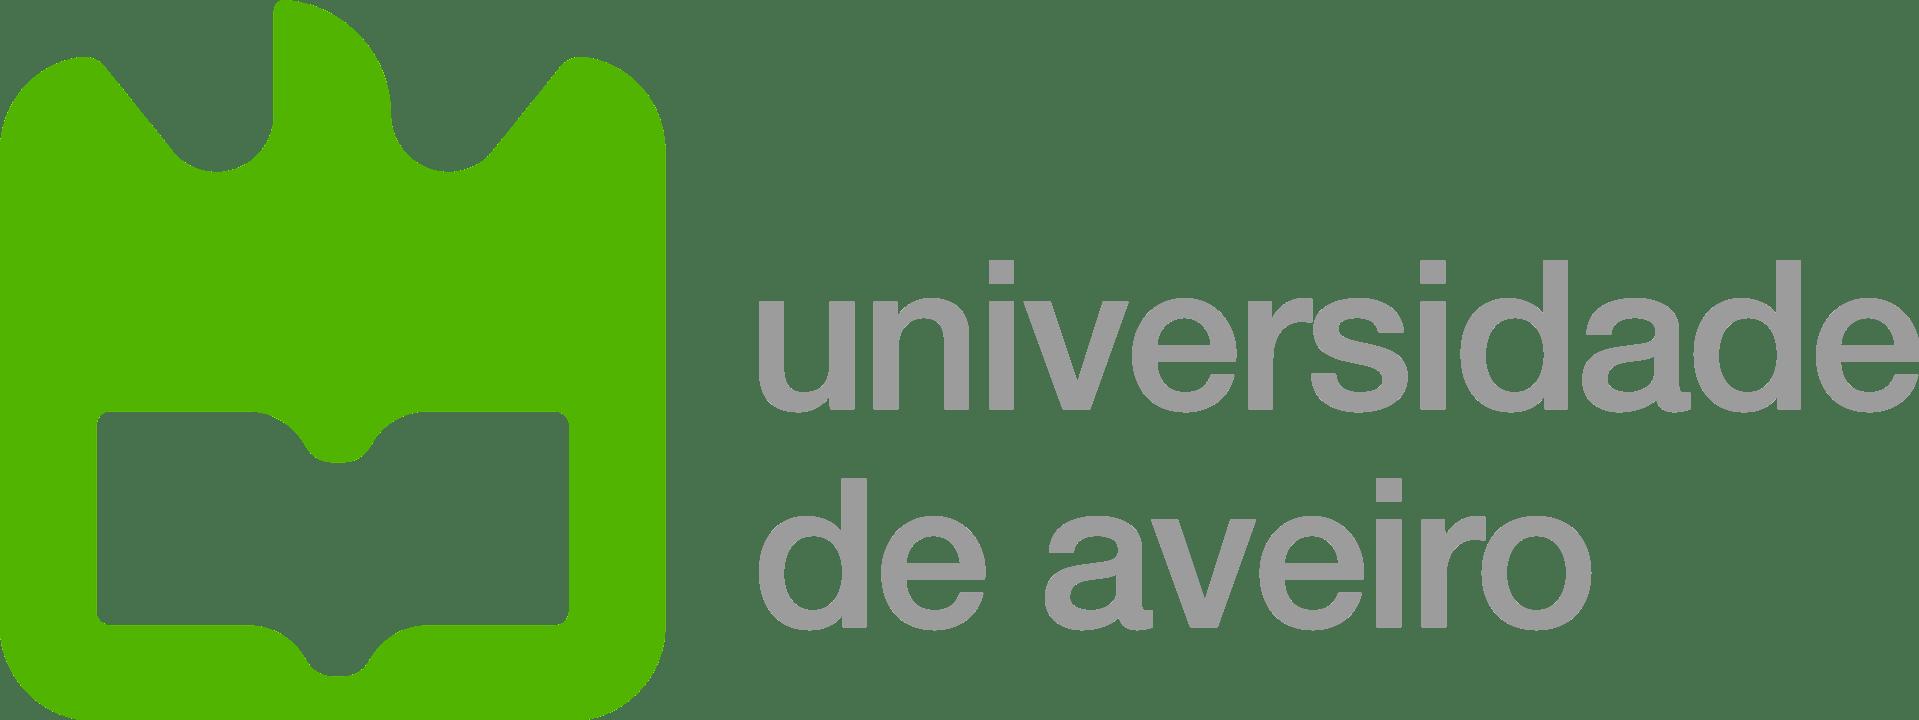 winegrid universidade de aveiro